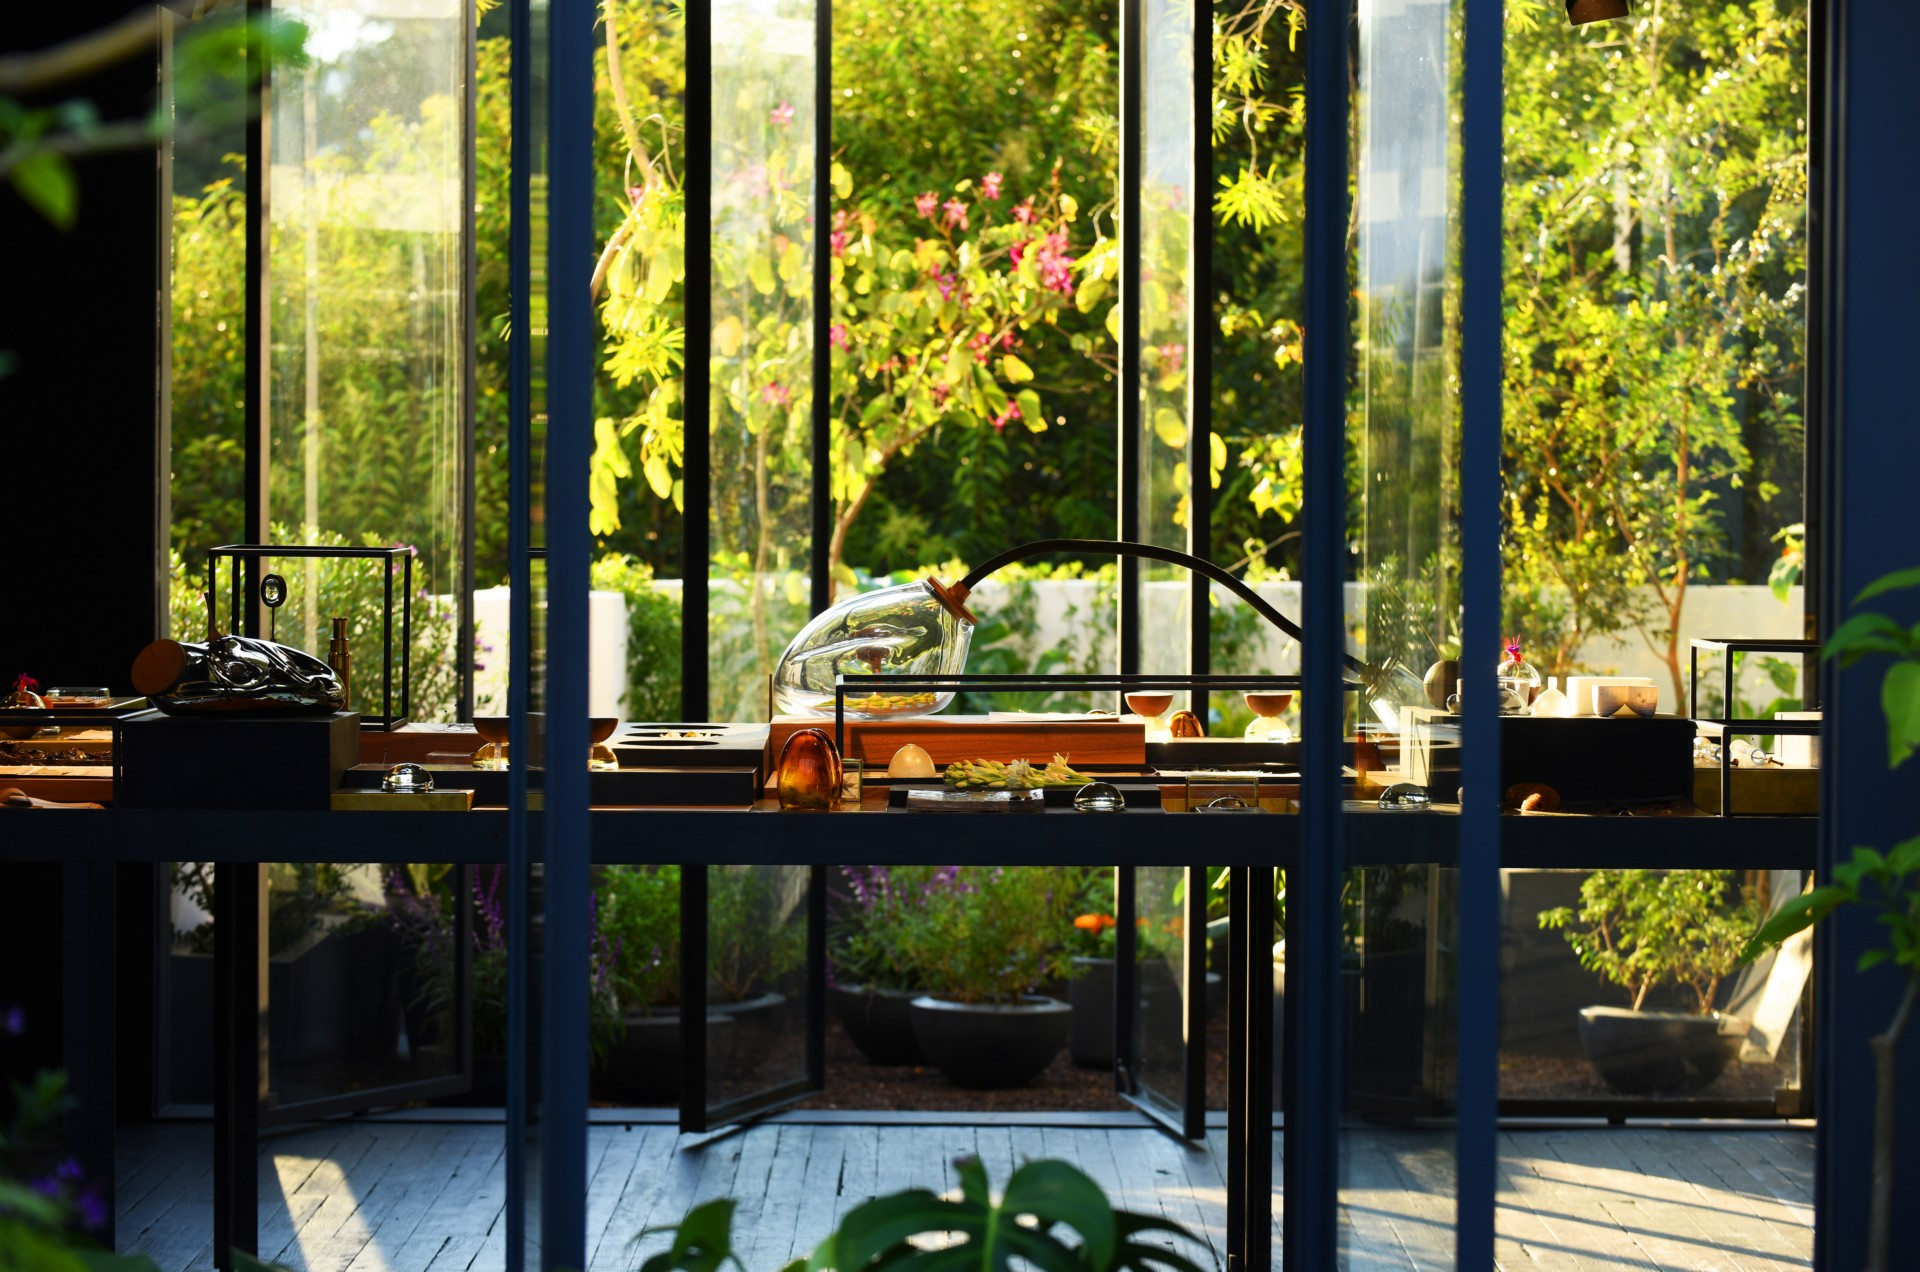 Xinù Perfumes' secret garden created by Cadena + Esrawe